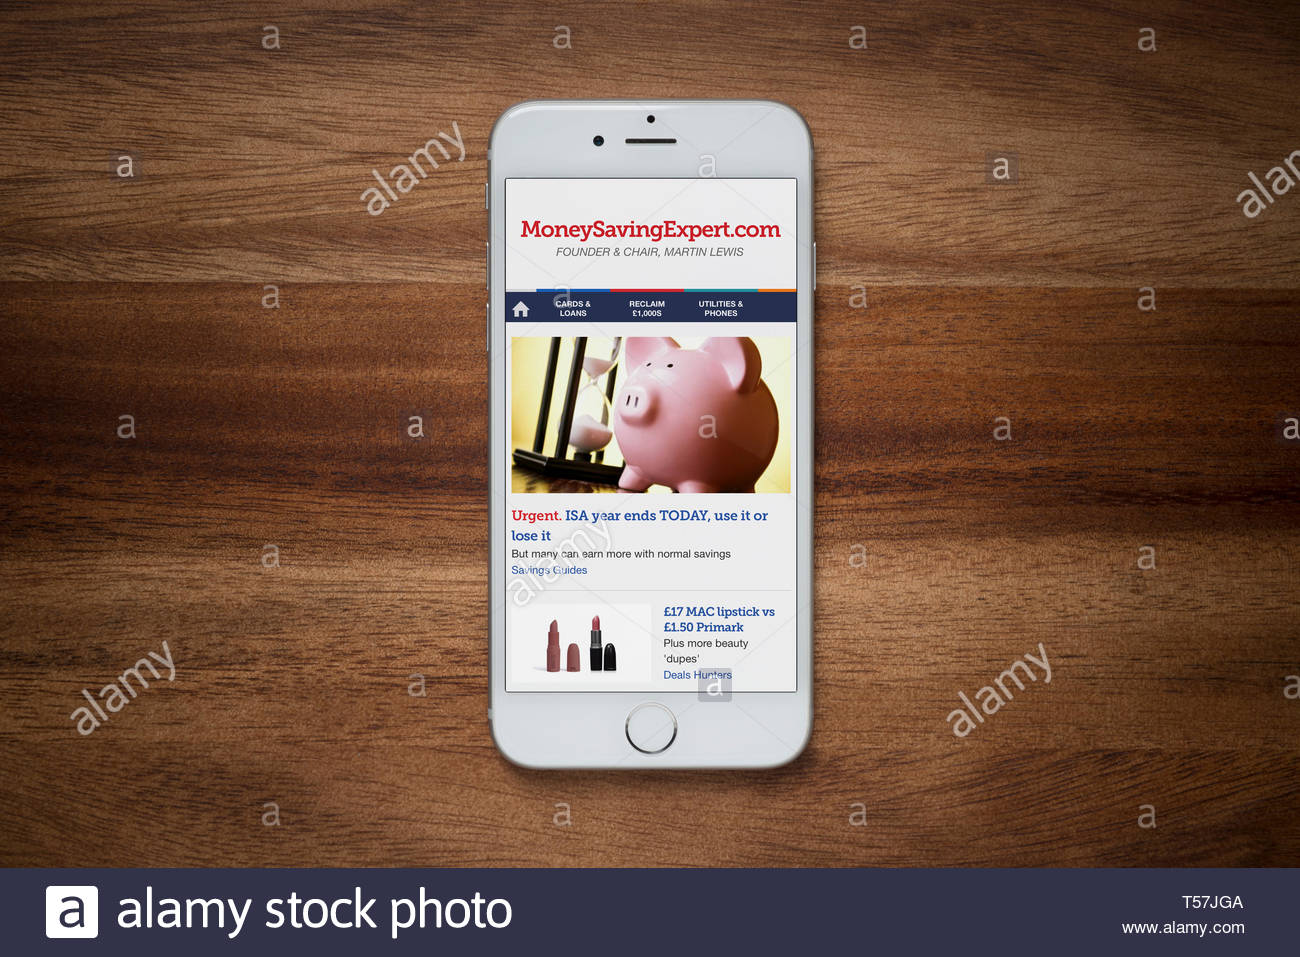 saving-money-on-a-smartphone-web-usage-2